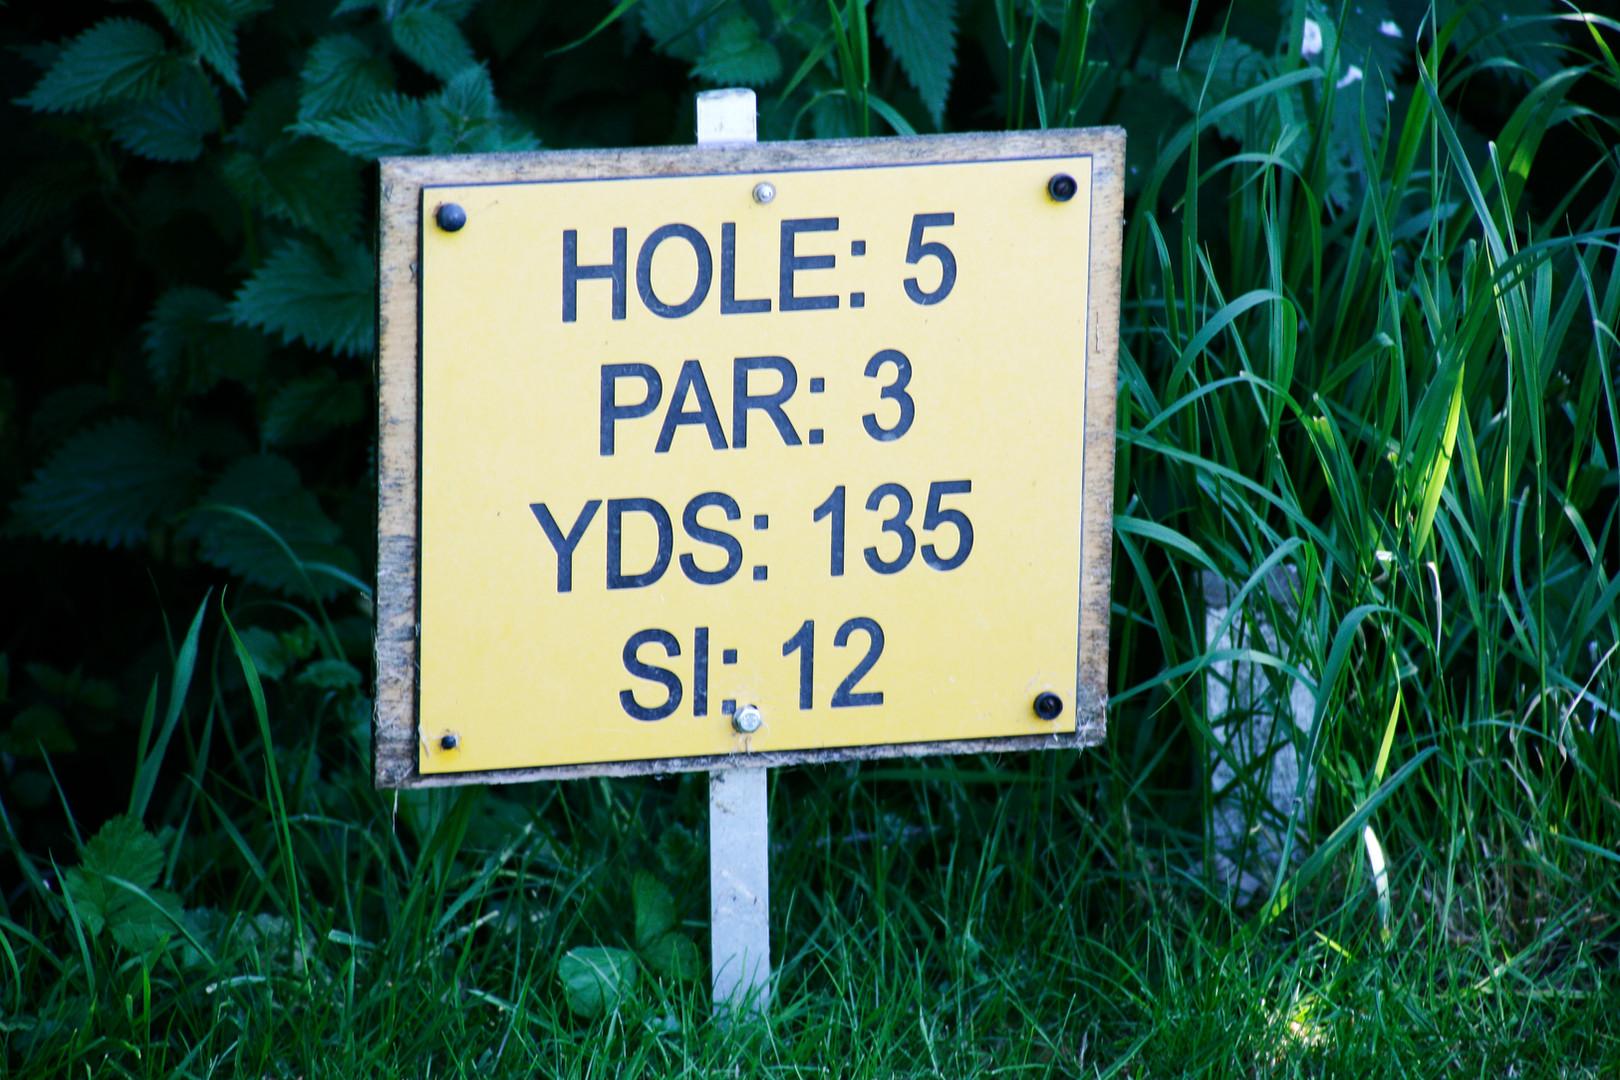 013 - Hole 5.JPG